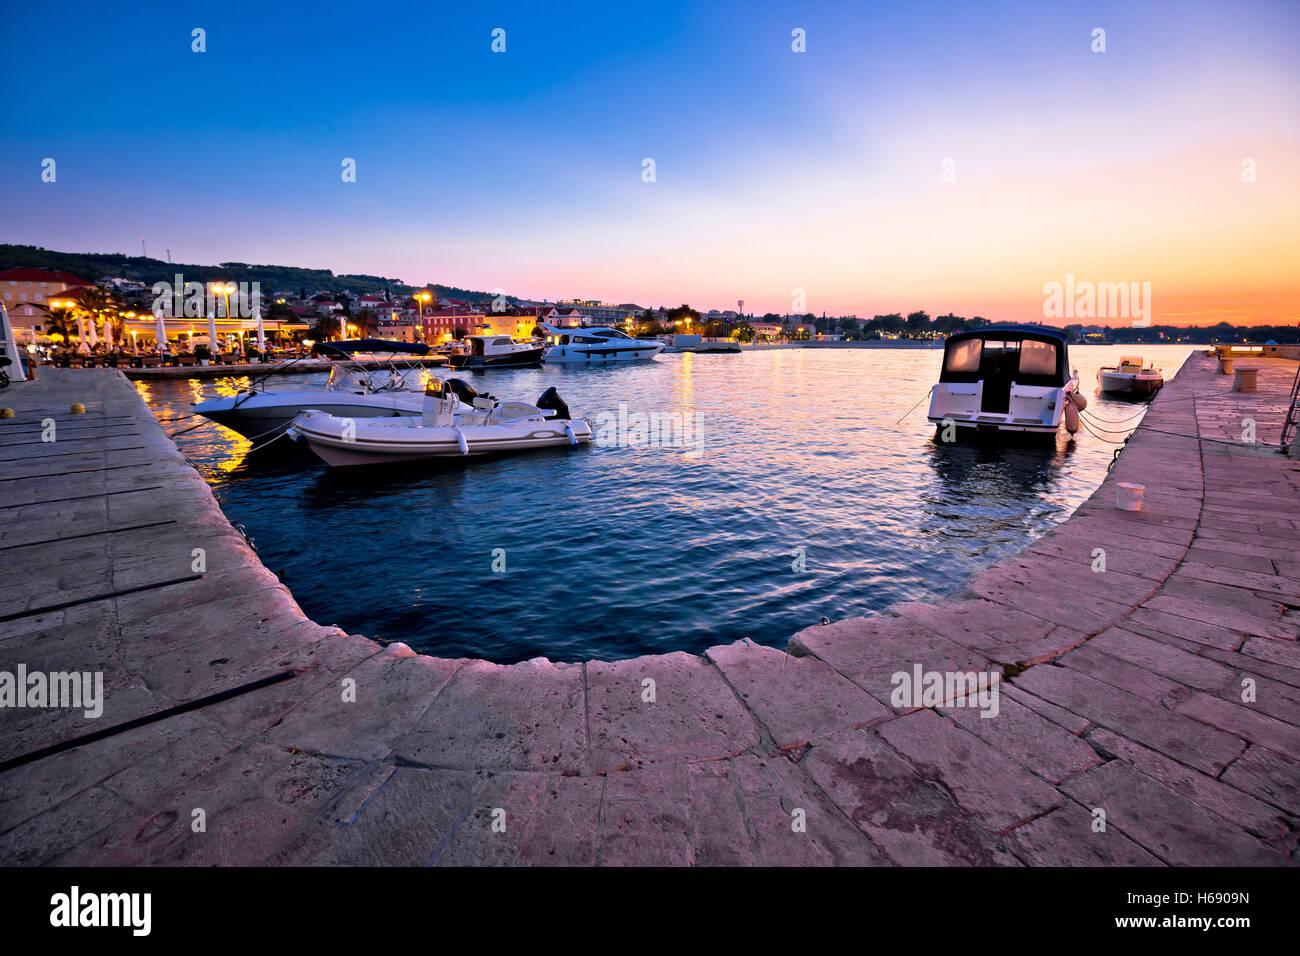 Supetar waterfront and harbor evening view, island of Brac, Dalmatia, Croatia - Stock Image